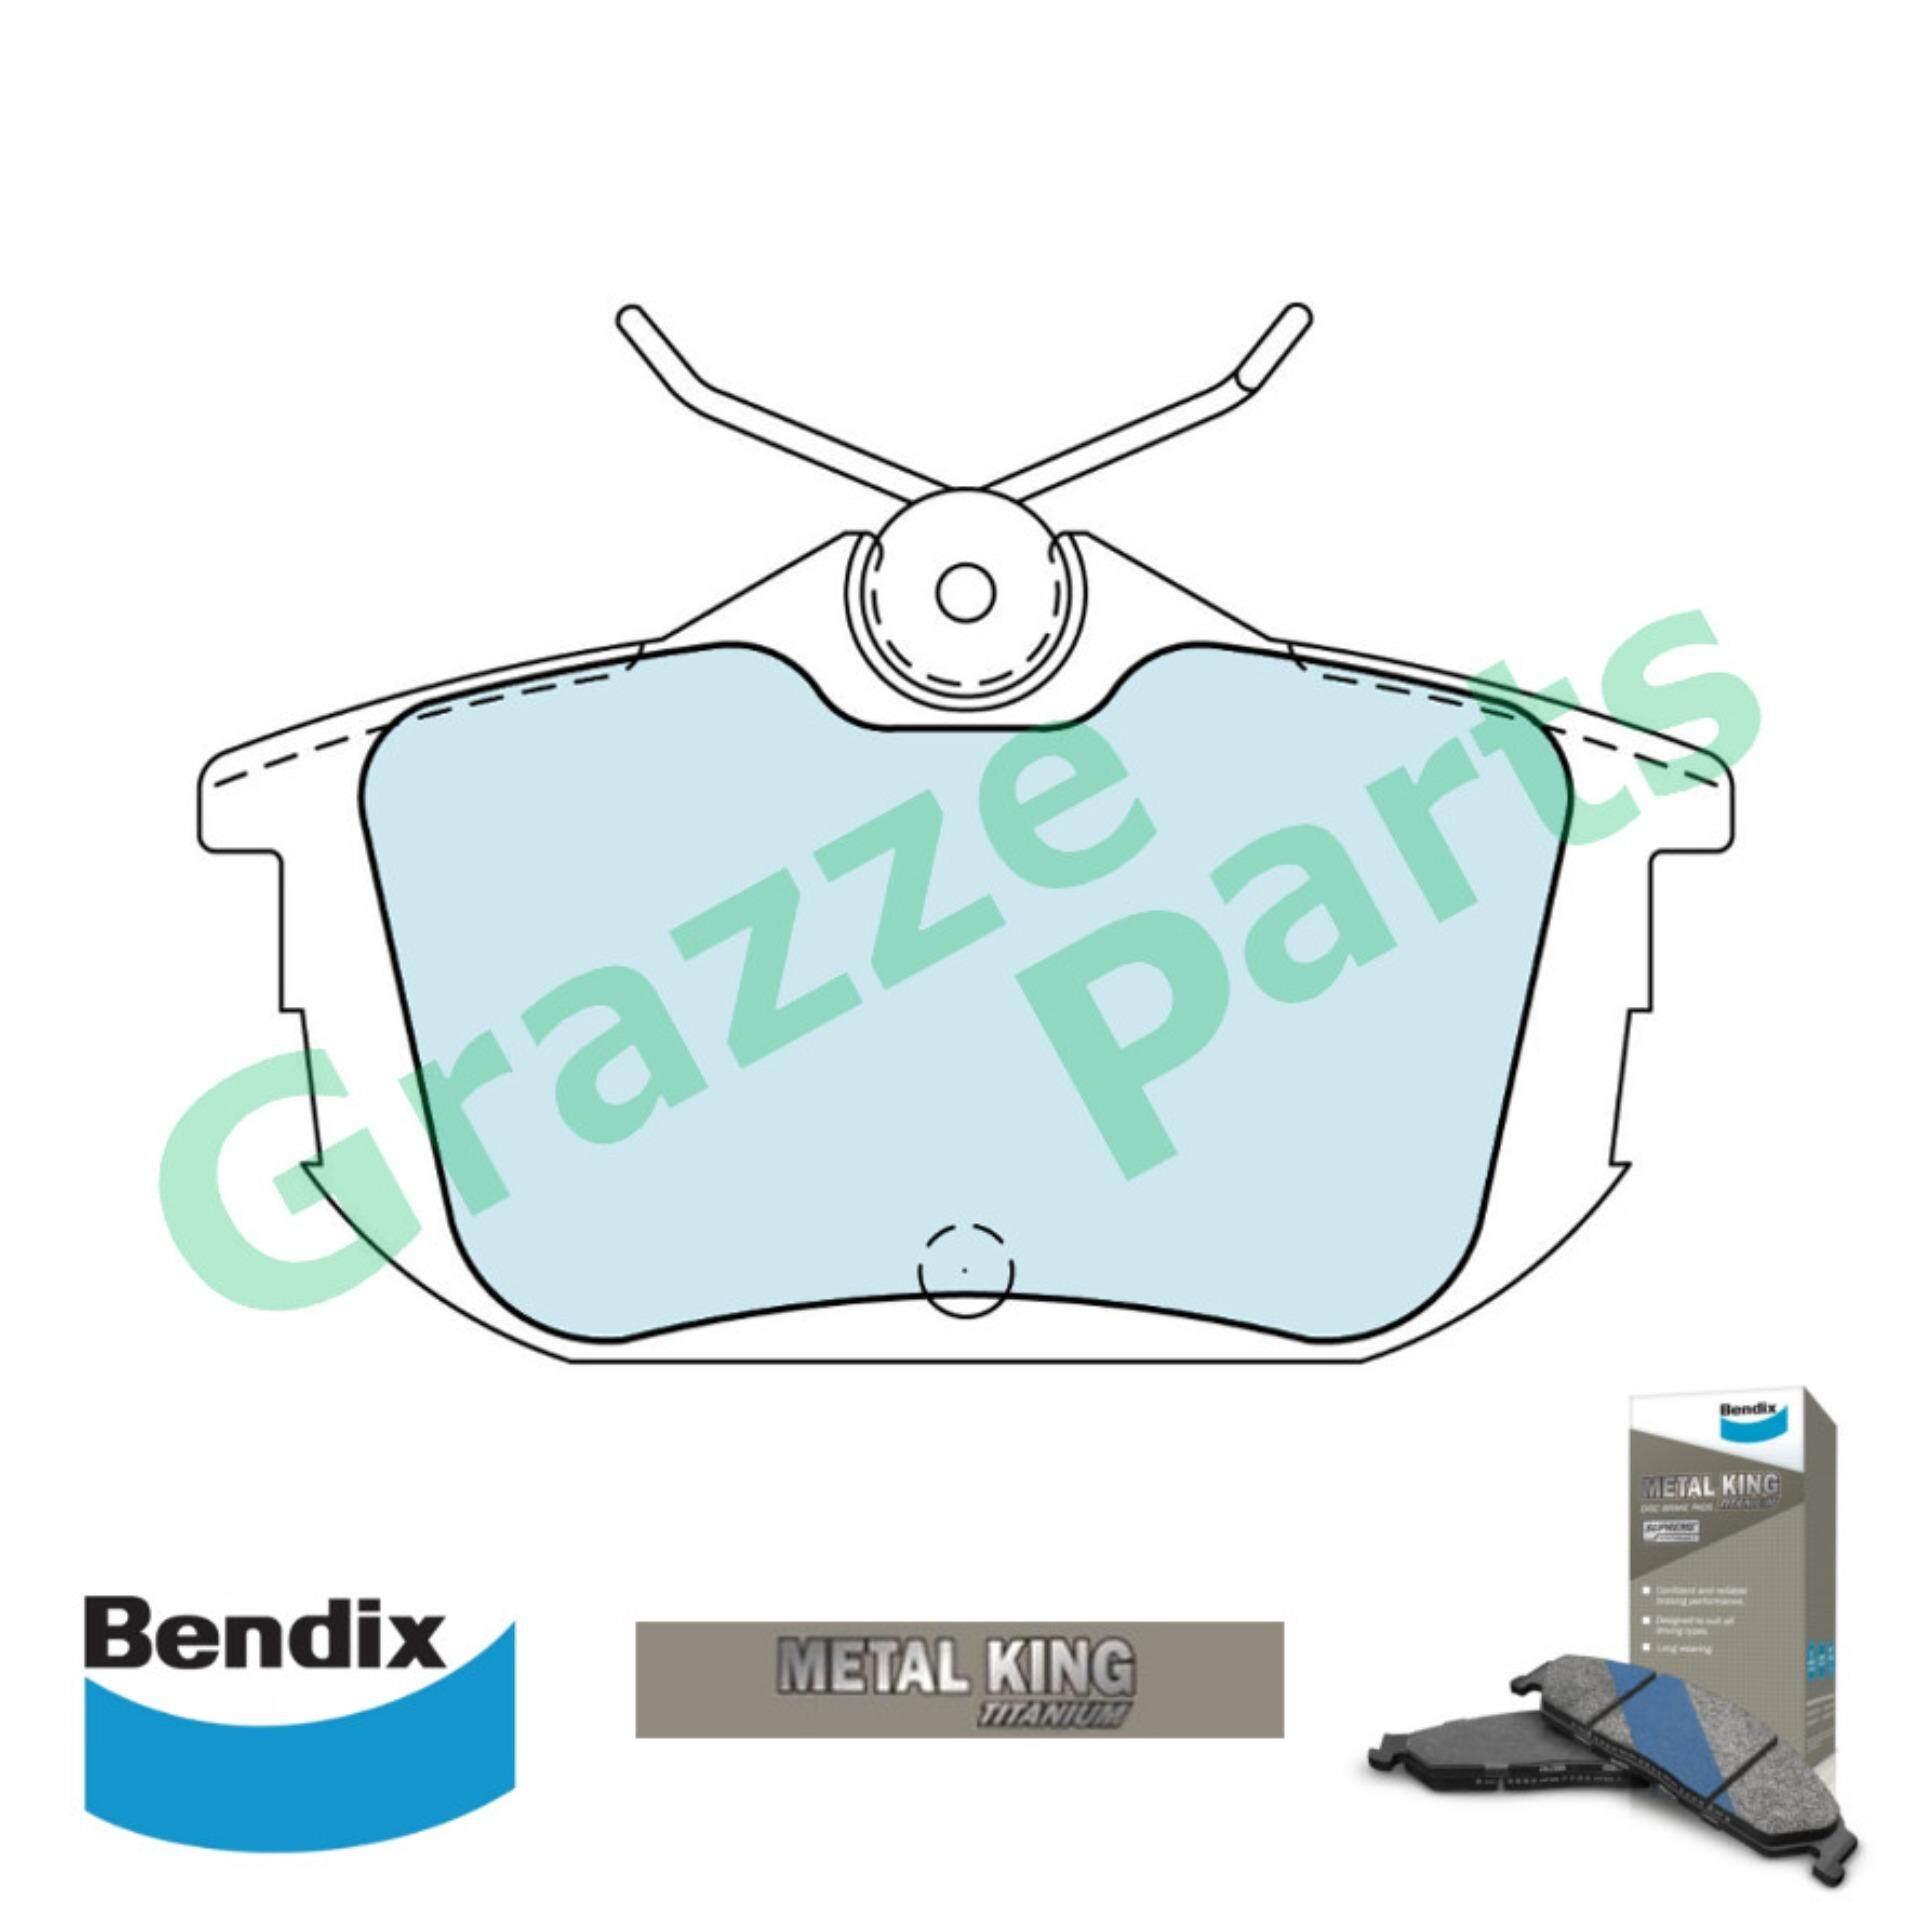 Bendix Metal King Titanium Disc Brake Pad Rear for DB1382 - Proton Waja 1.6 1.8 Volvo S40 2.0